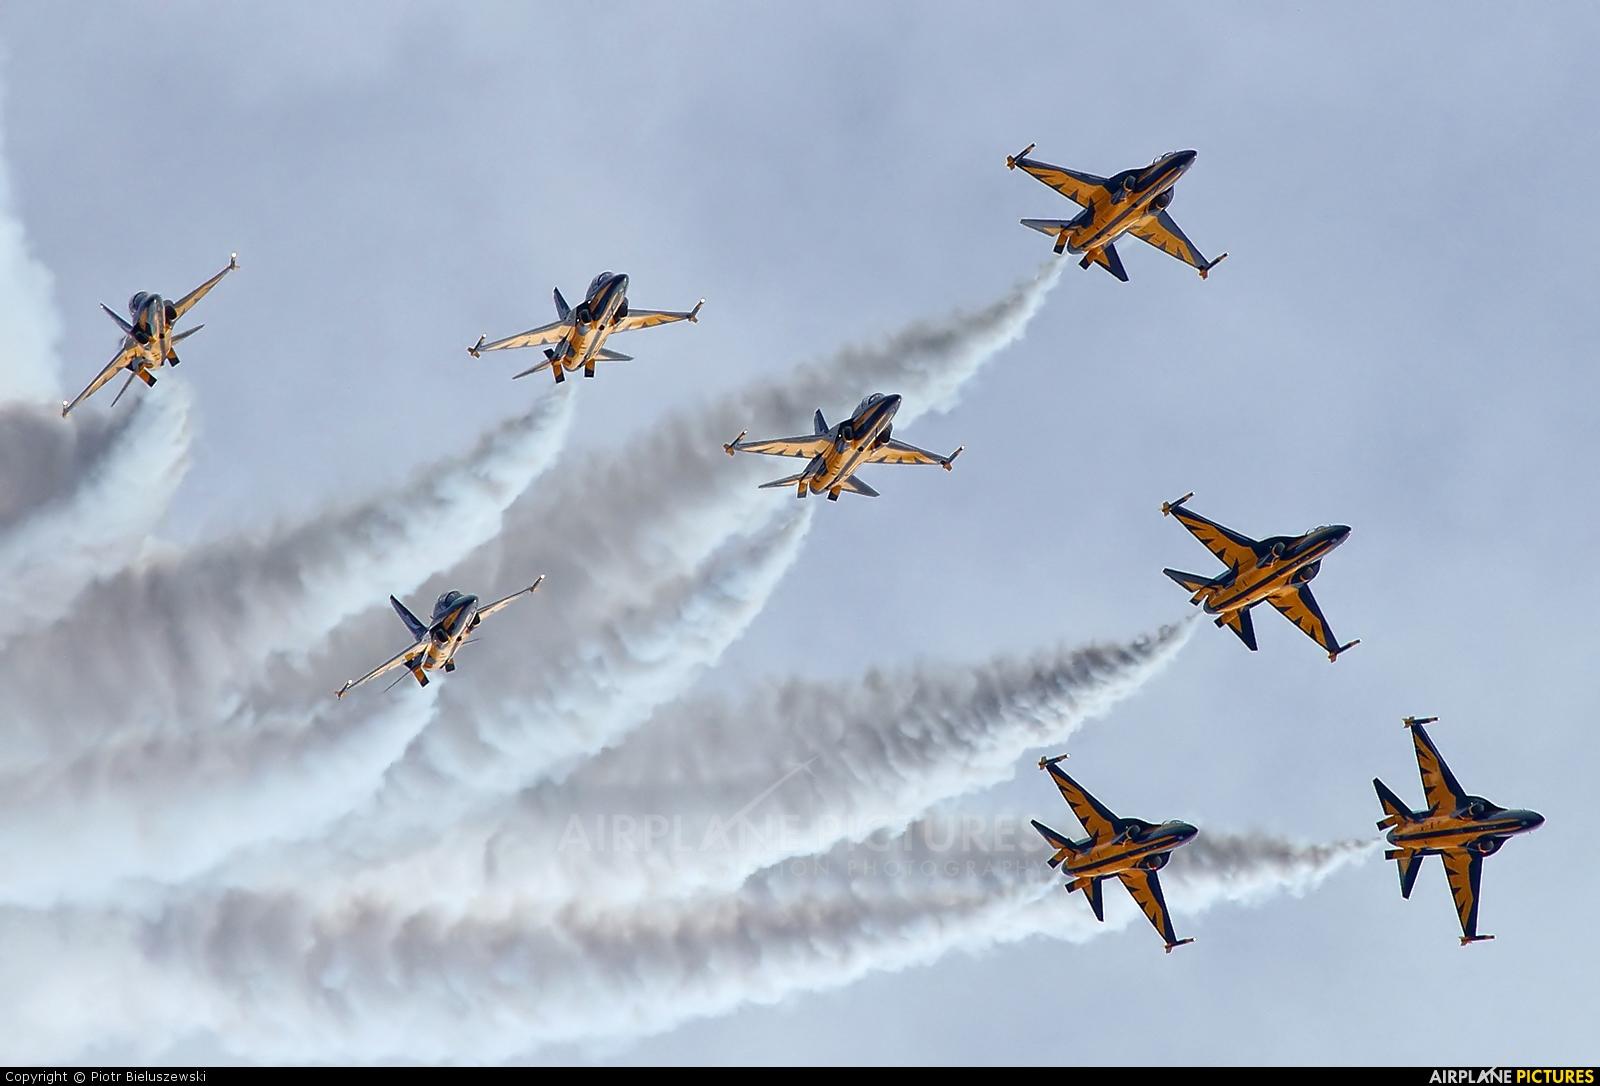 Korea (South) - Air Force: Black Eagles Korean Aerospace T-50 Golden